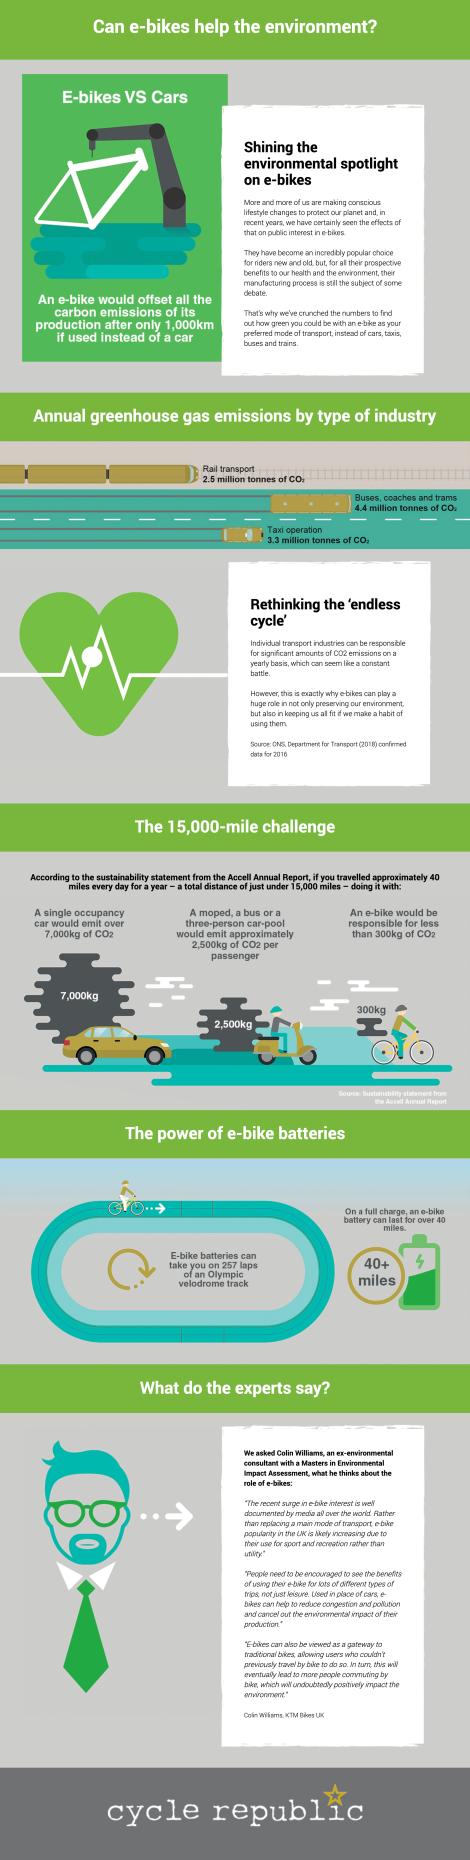 Can E-bikes help the Environment? [Infographic] | ecogreenlove